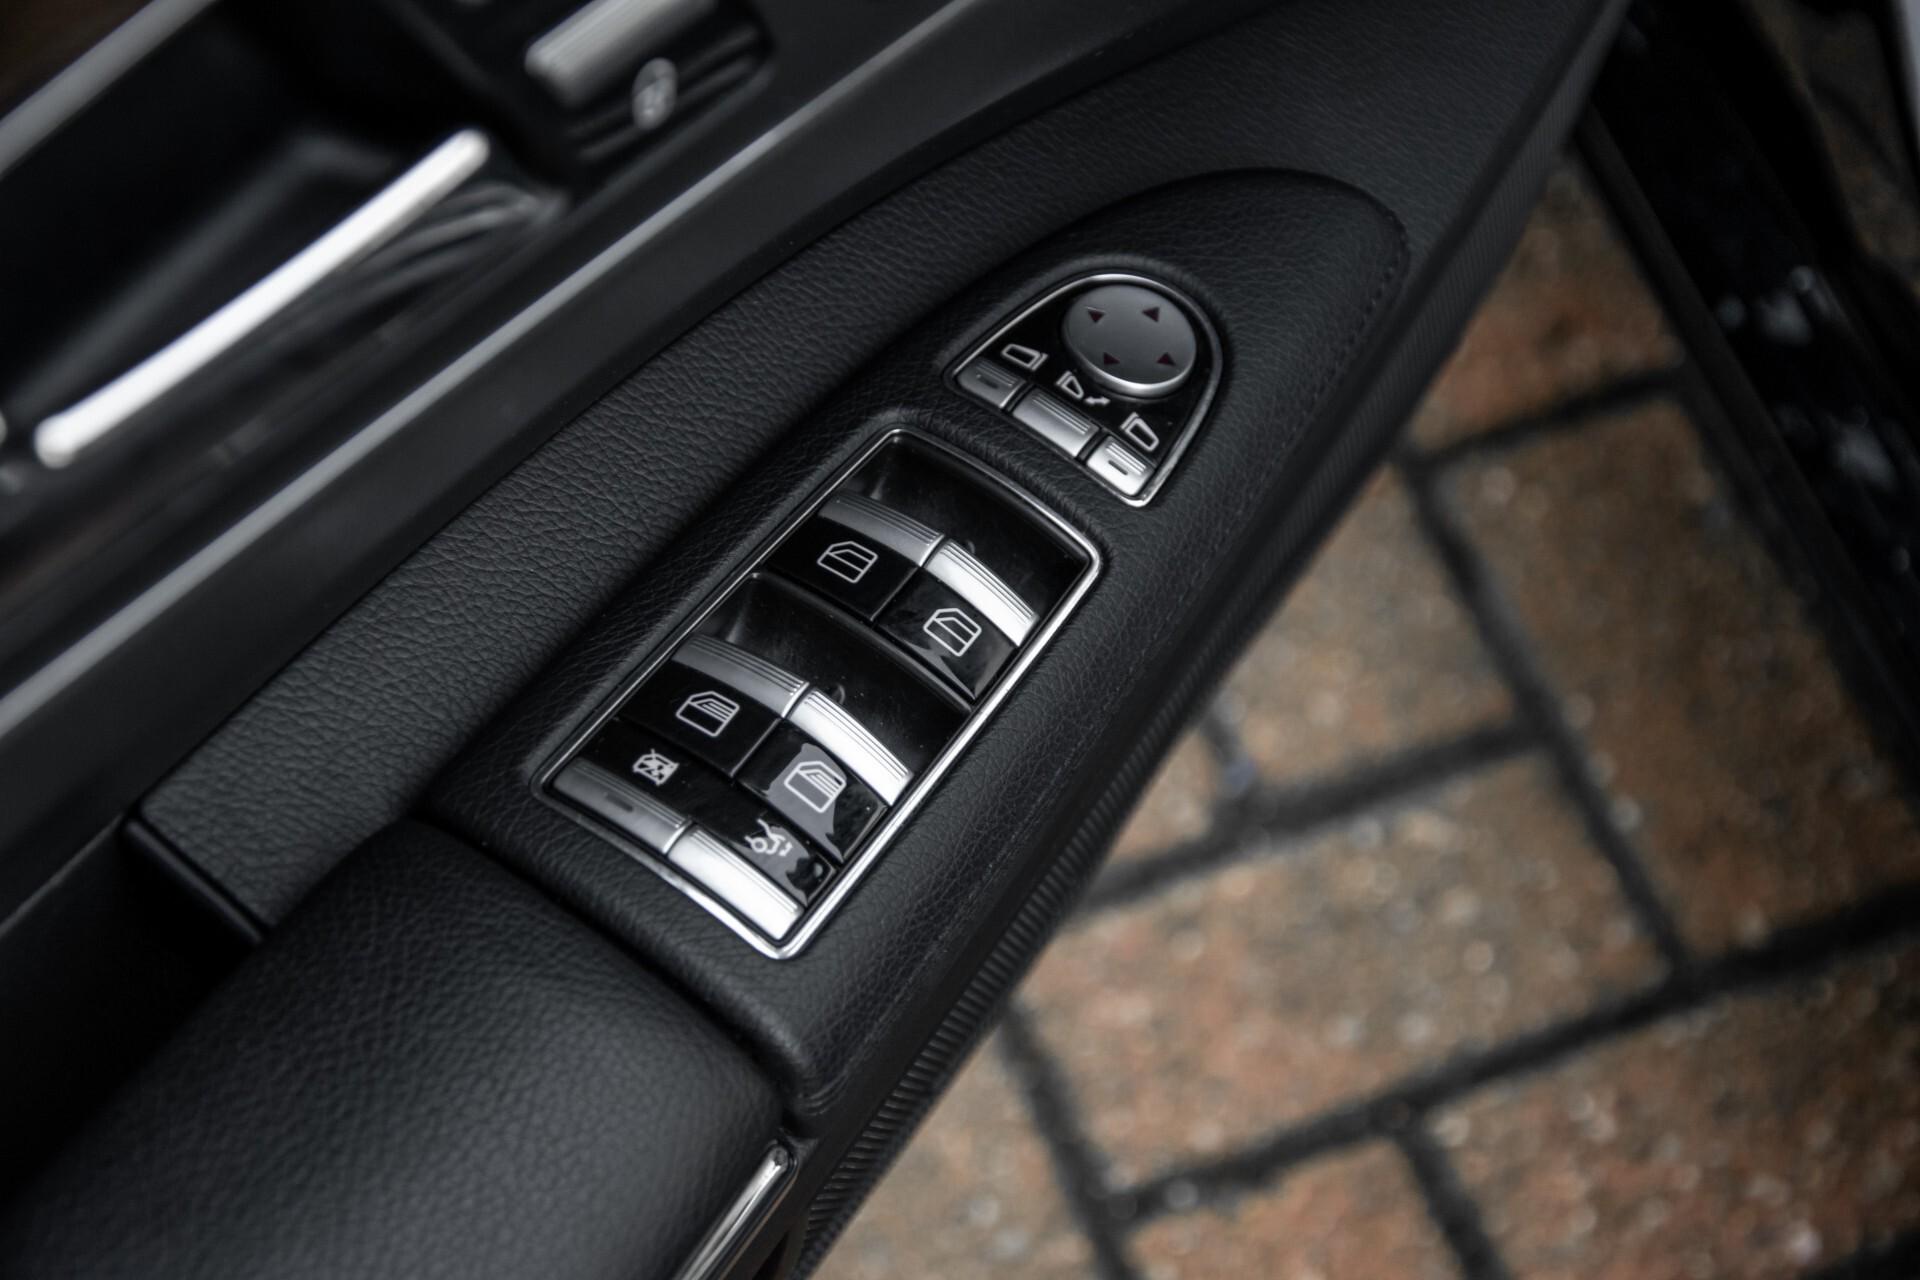 Mercedes-Benz S-Klasse 350 Bluetec Keyless/Distronic/Nightvision/Schuifdak/Harman-Kardon Aut7 Foto 41